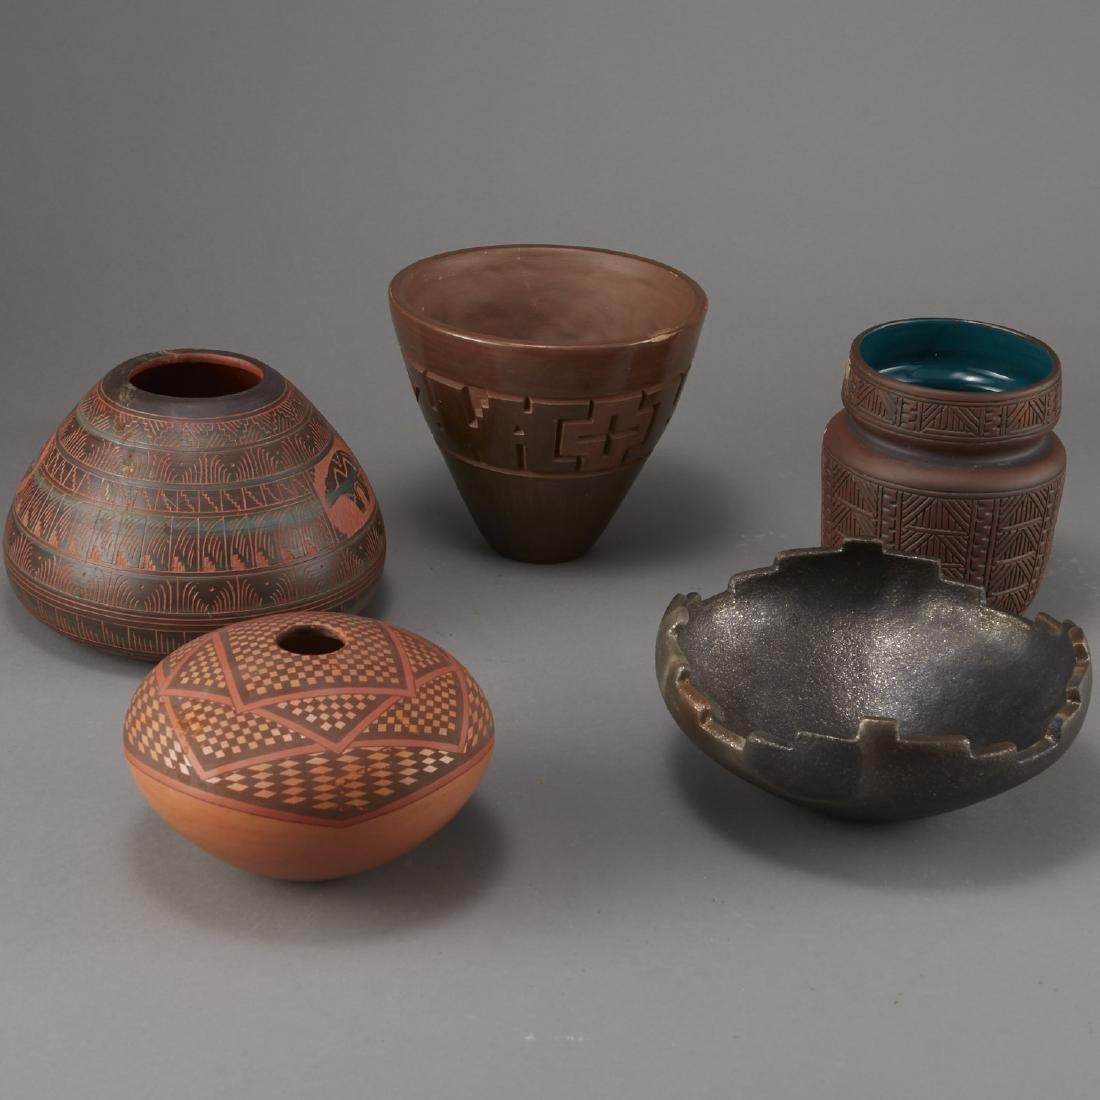 5 Pieces of Native American Pottery Sheldon Nunez - 3